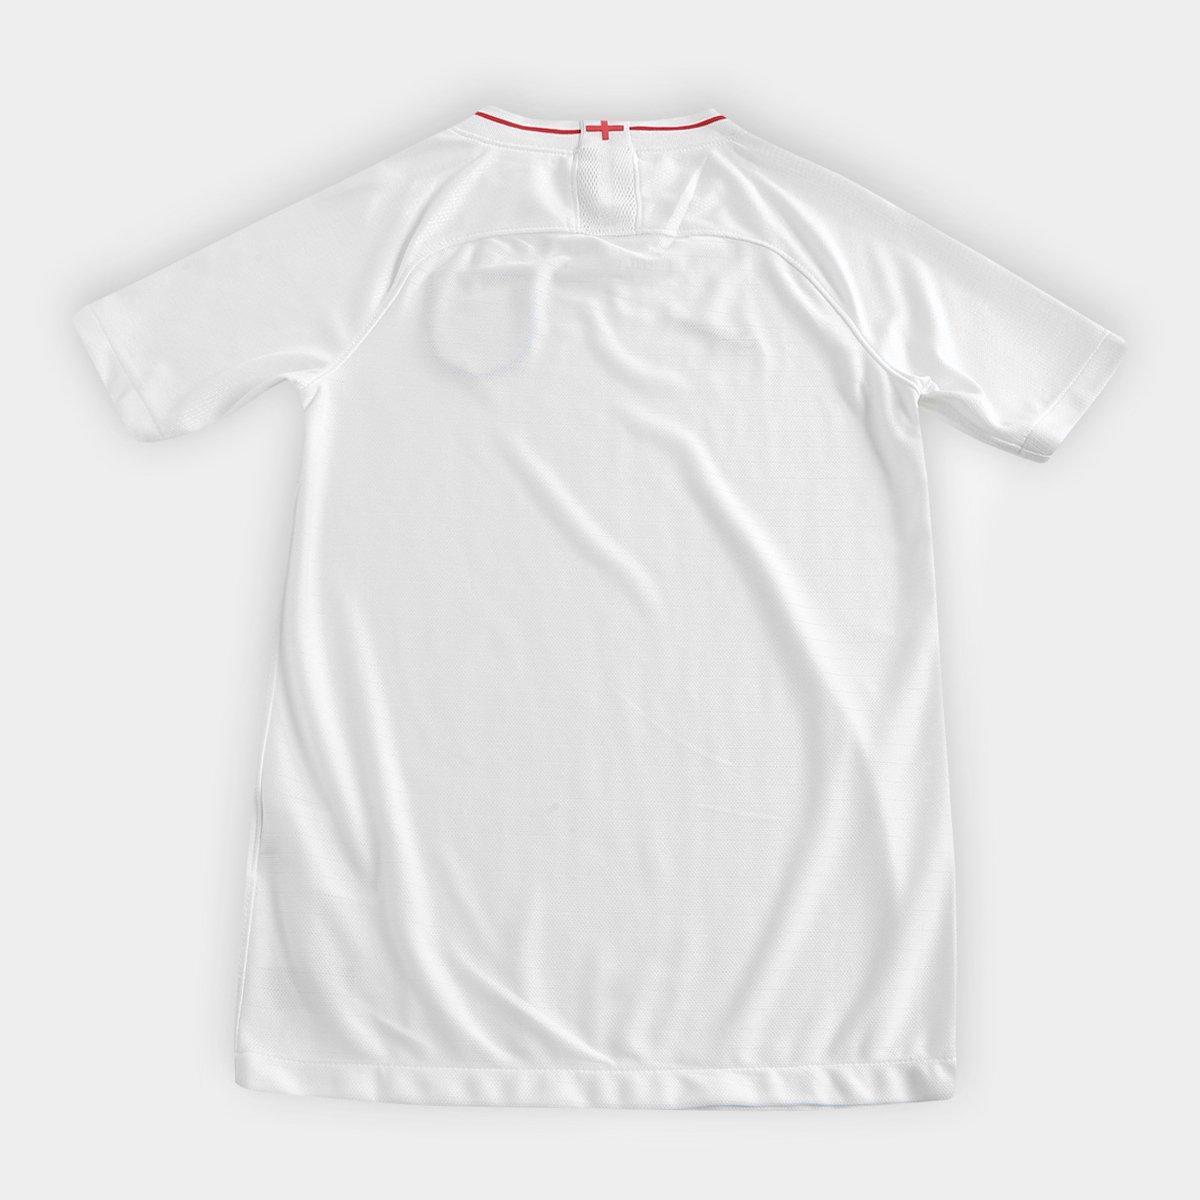 Seleção Home Inglaterra s Camisa Torcedor Nike 2018 Branco n° Juvenil 6vBttxwdq